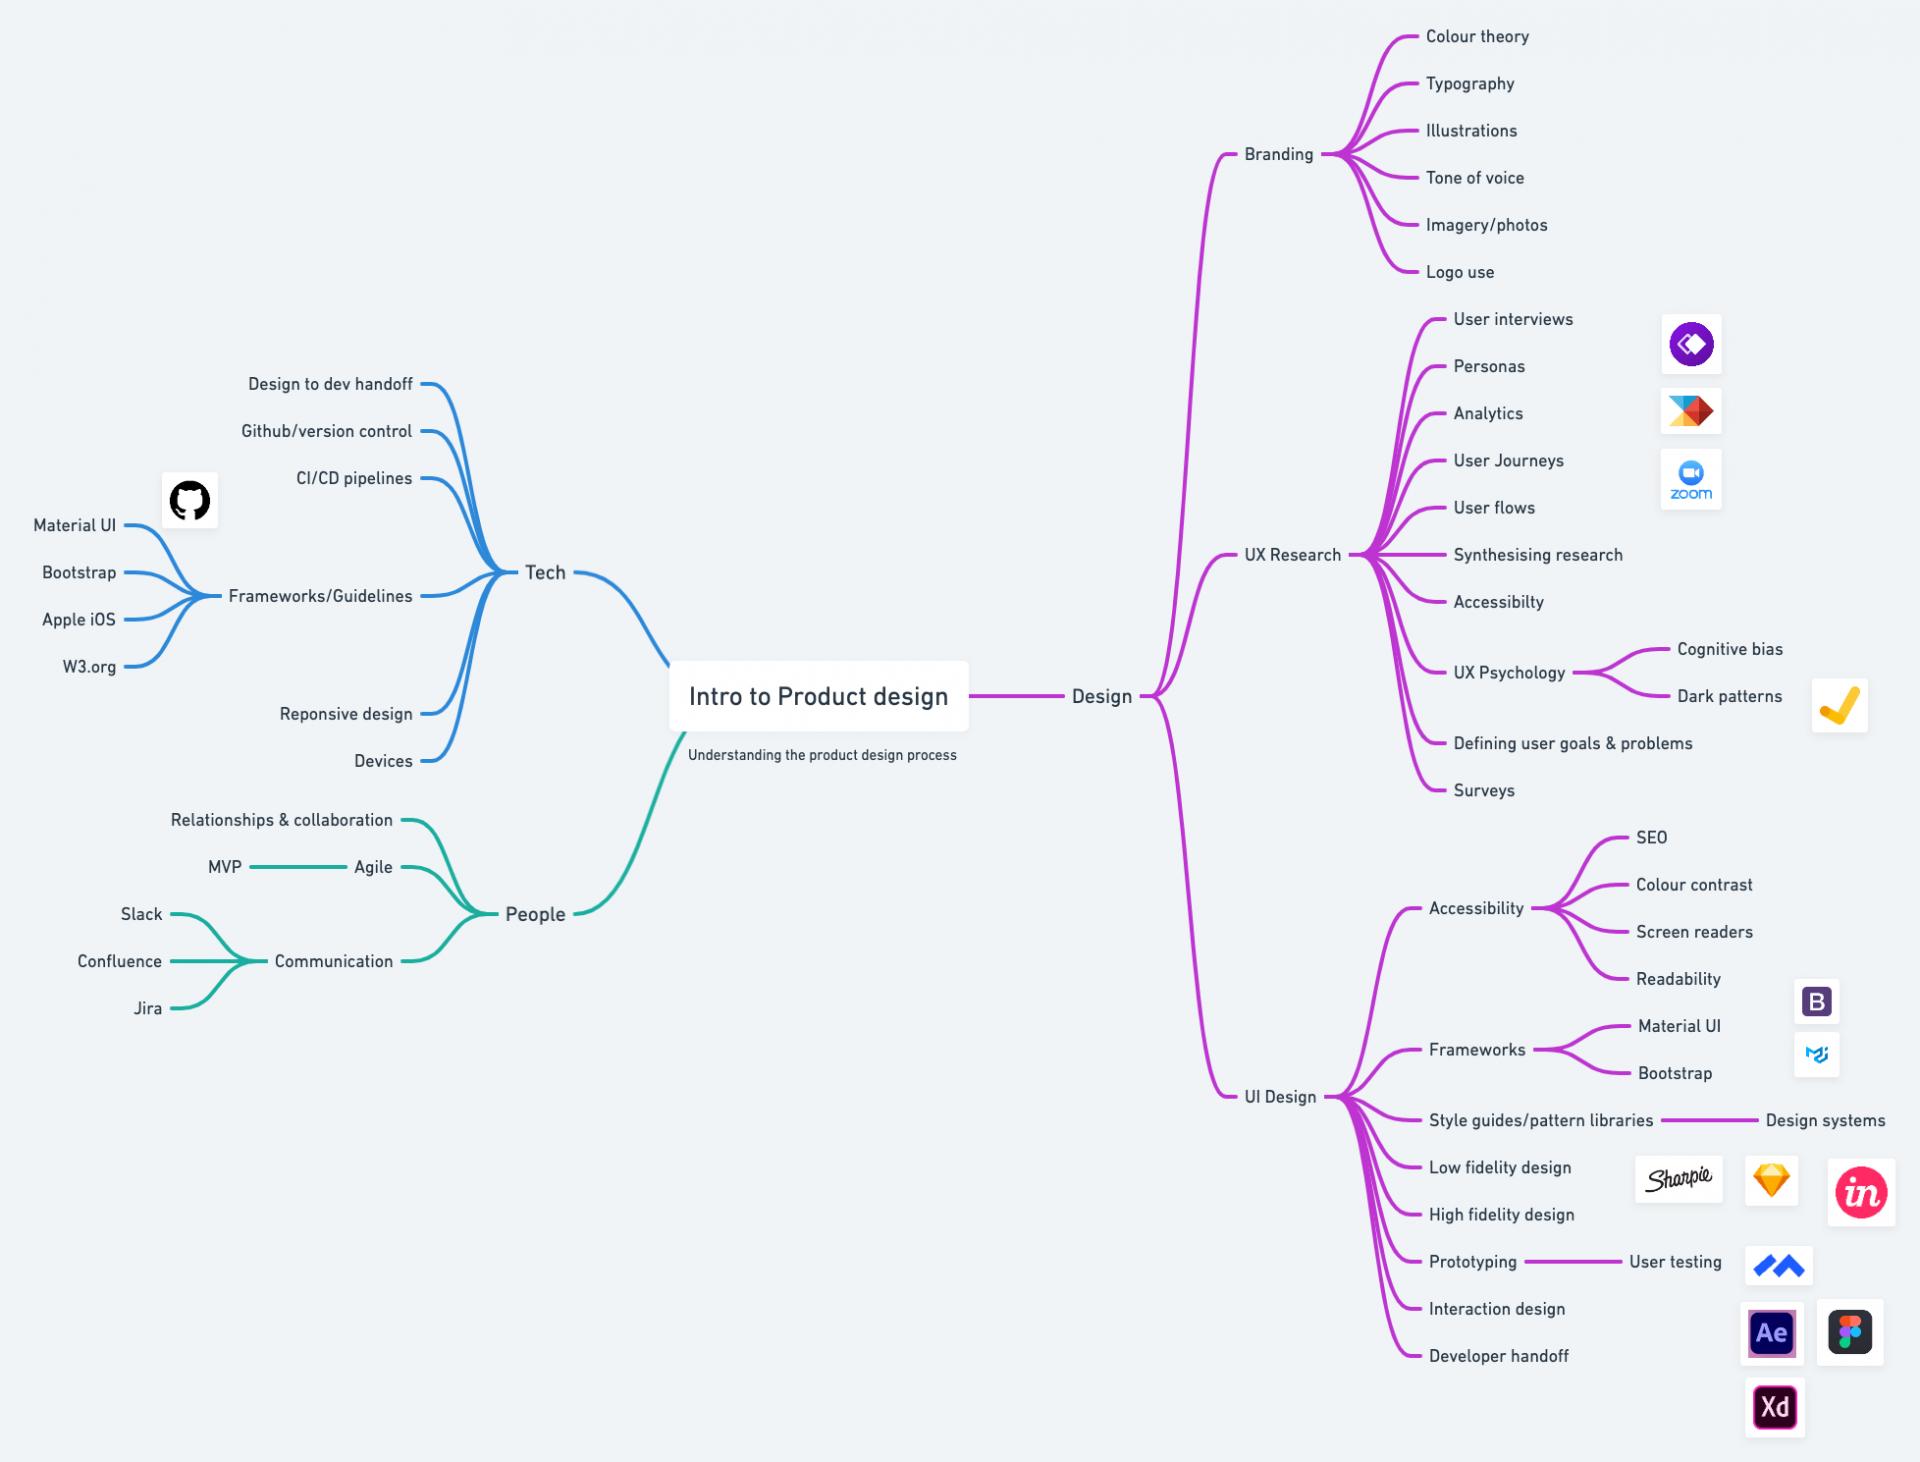 Intro to product design mindmap.